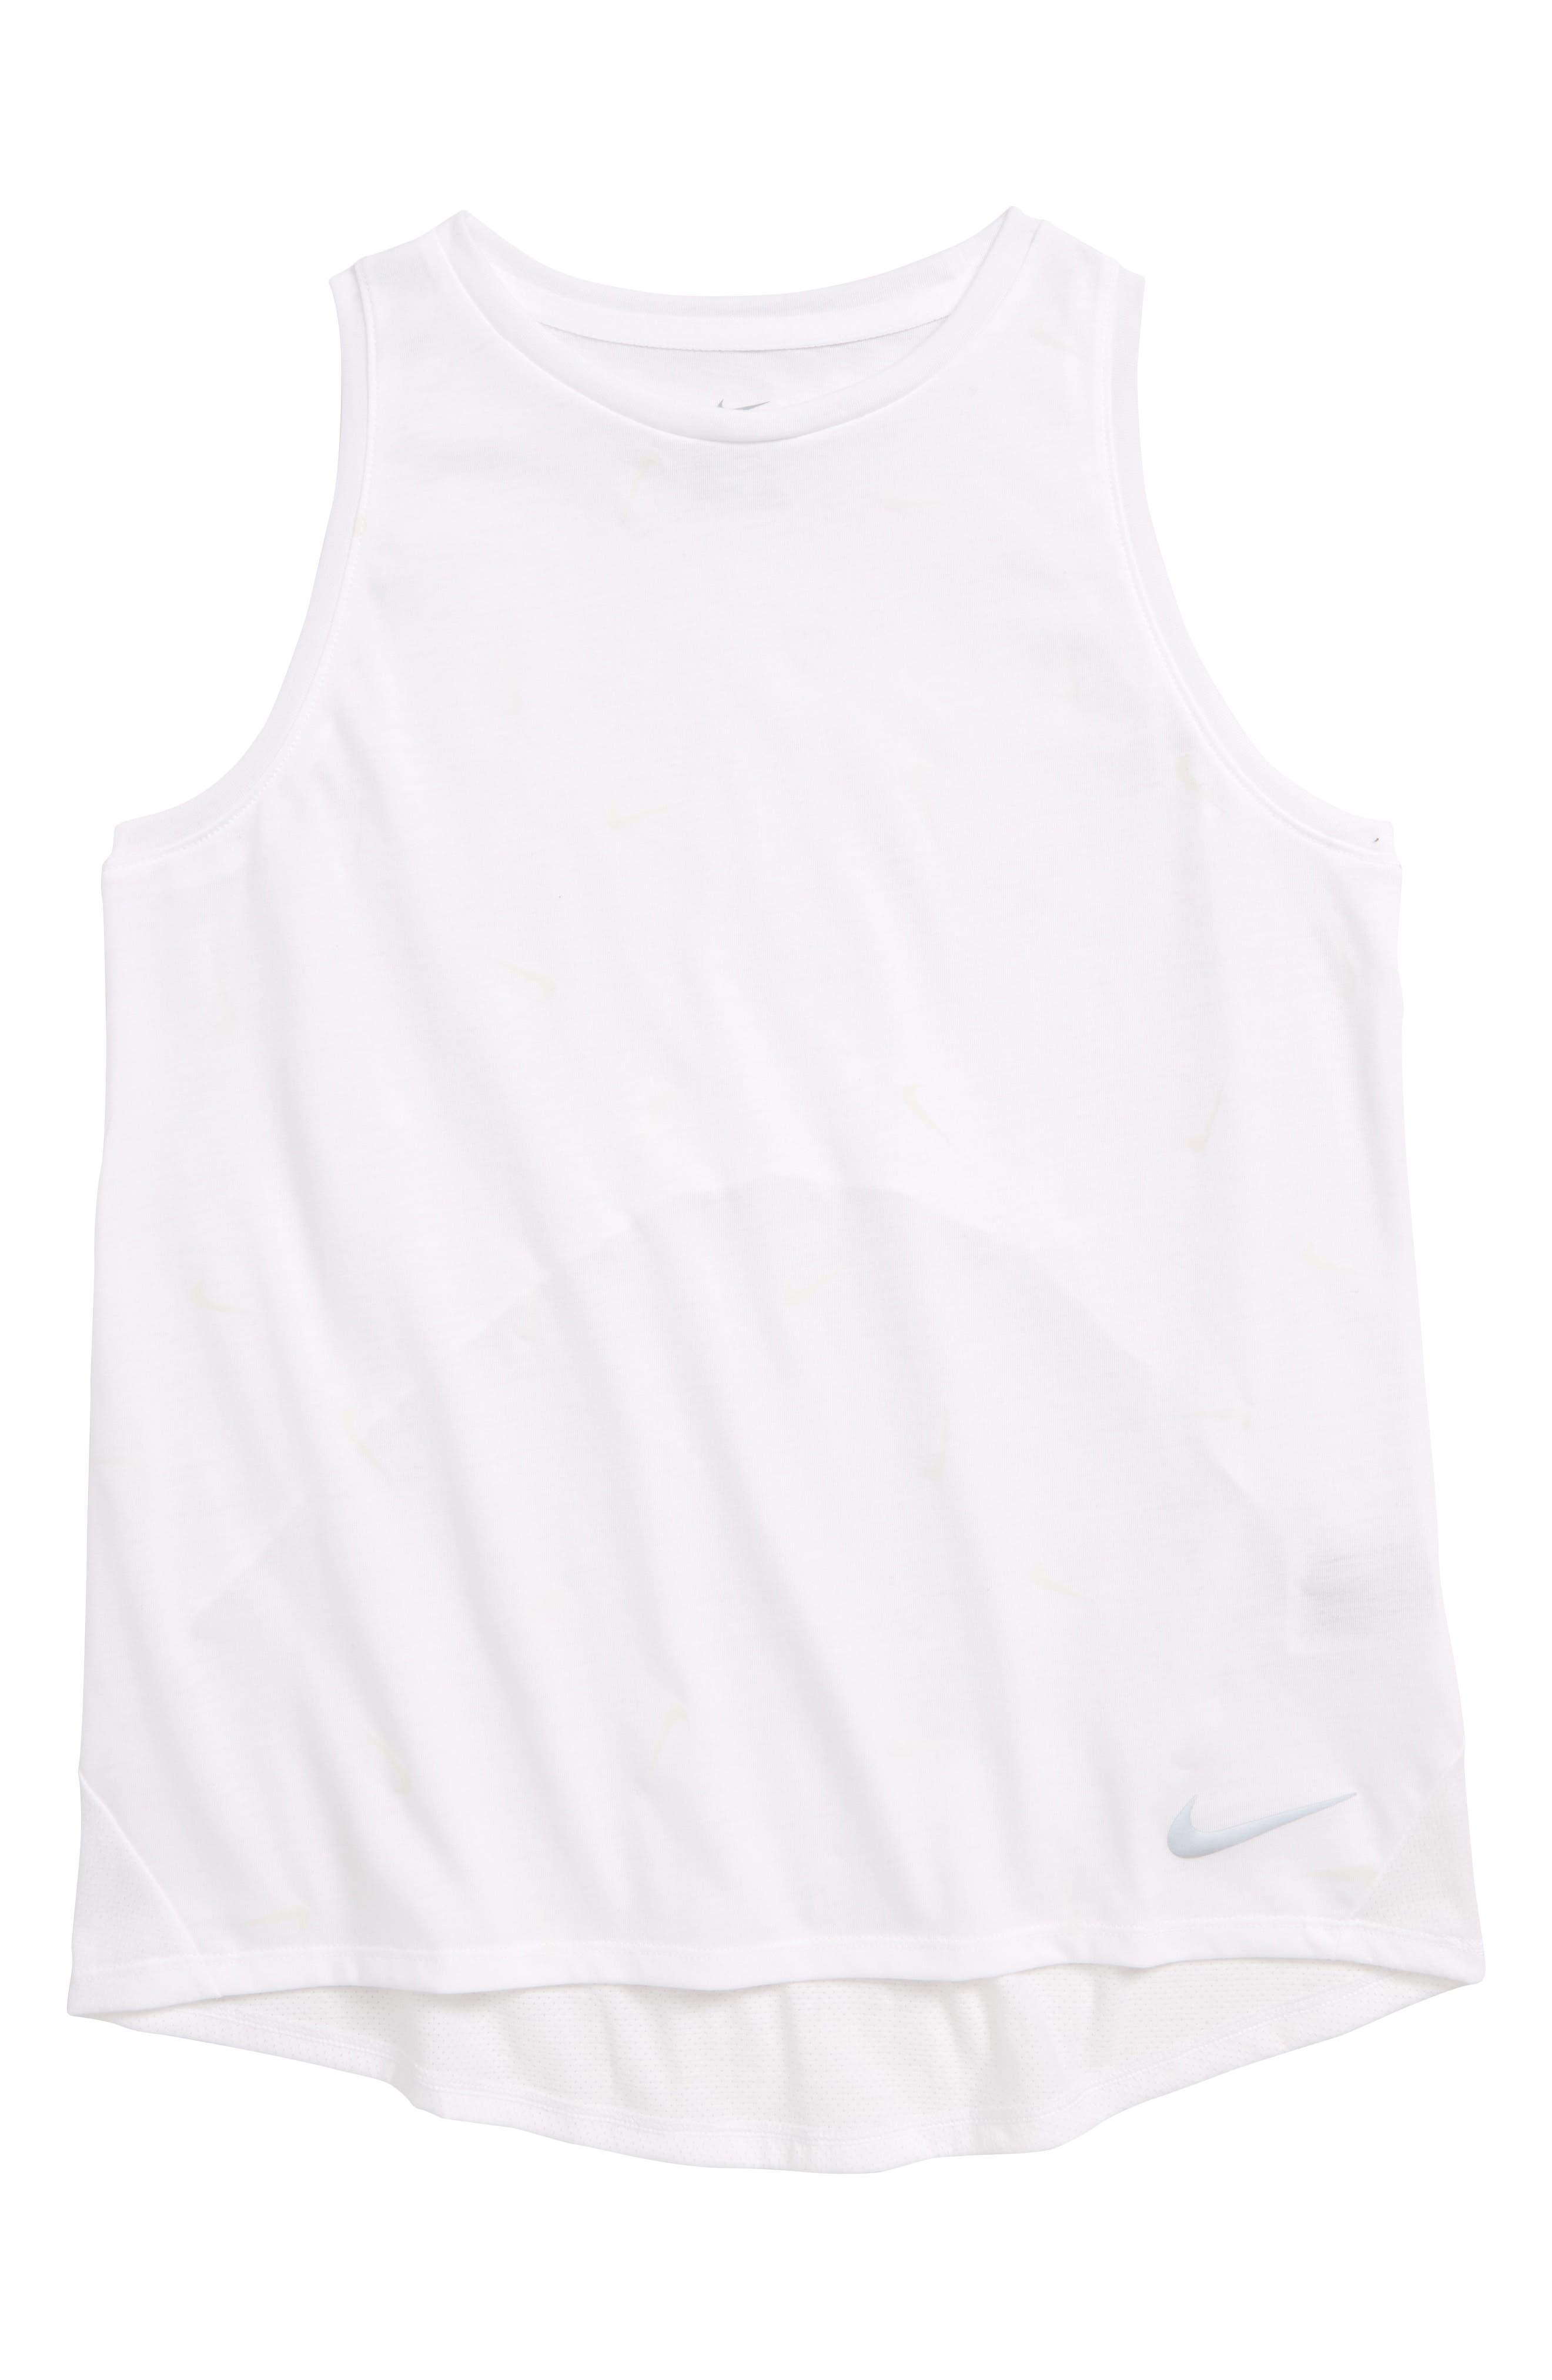 NIKE, Dri-FIT Breathe UV-Activated Logo Print Running Tank, Main thumbnail 1, color, WHITE/ REFLECTIVE SILV